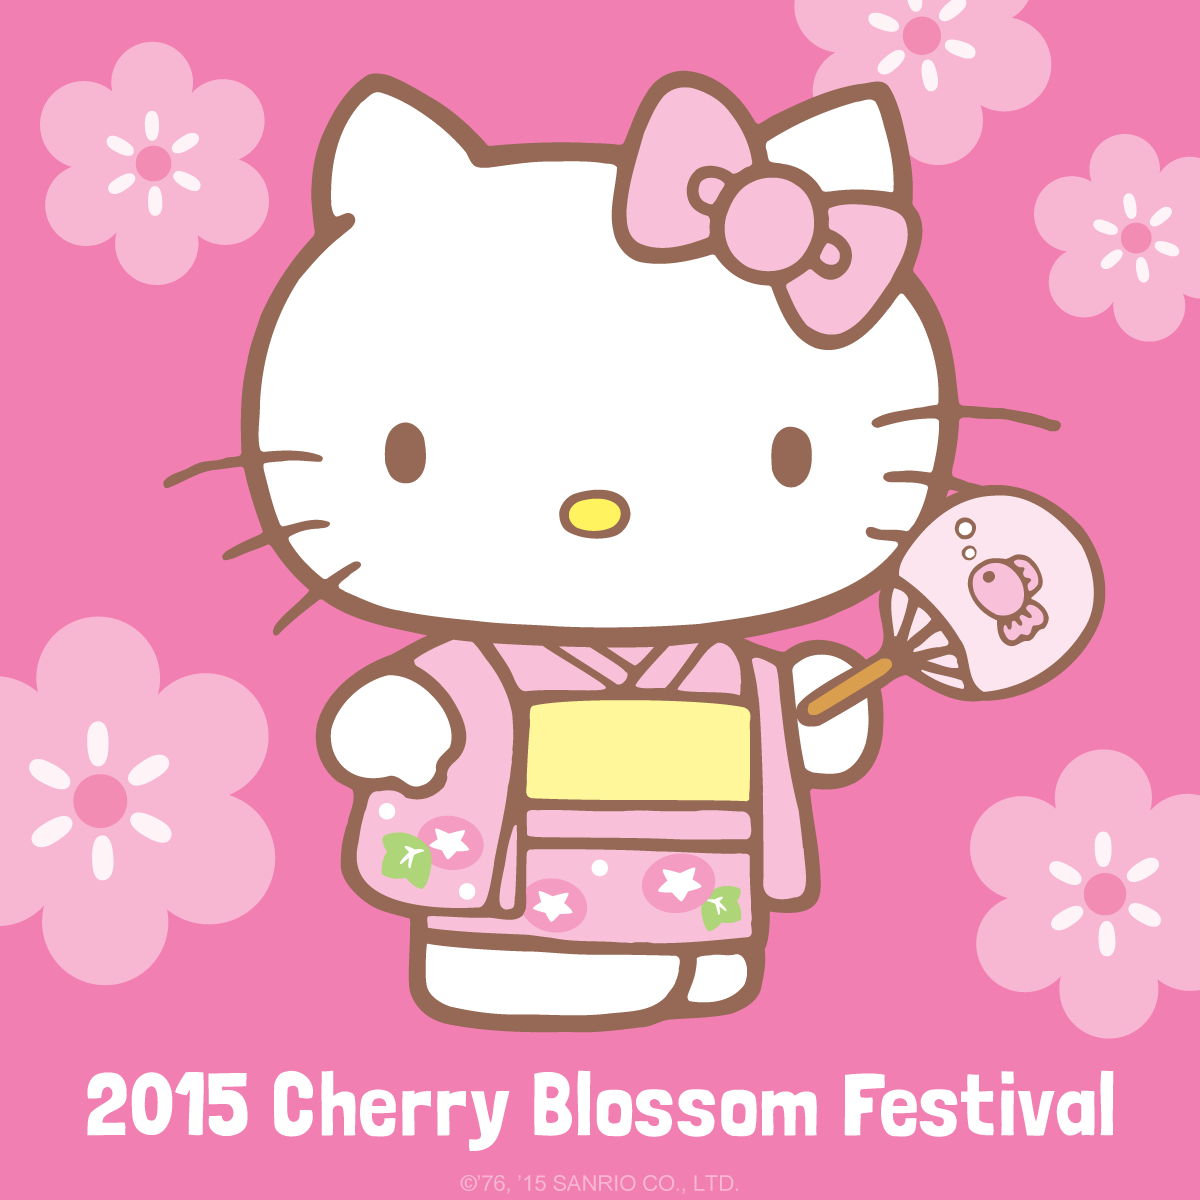 Download Wallpaper Hello Kitty Sakura - f2cabdca9bed1d91e002fed7860492f0  Snapshot_906418.png